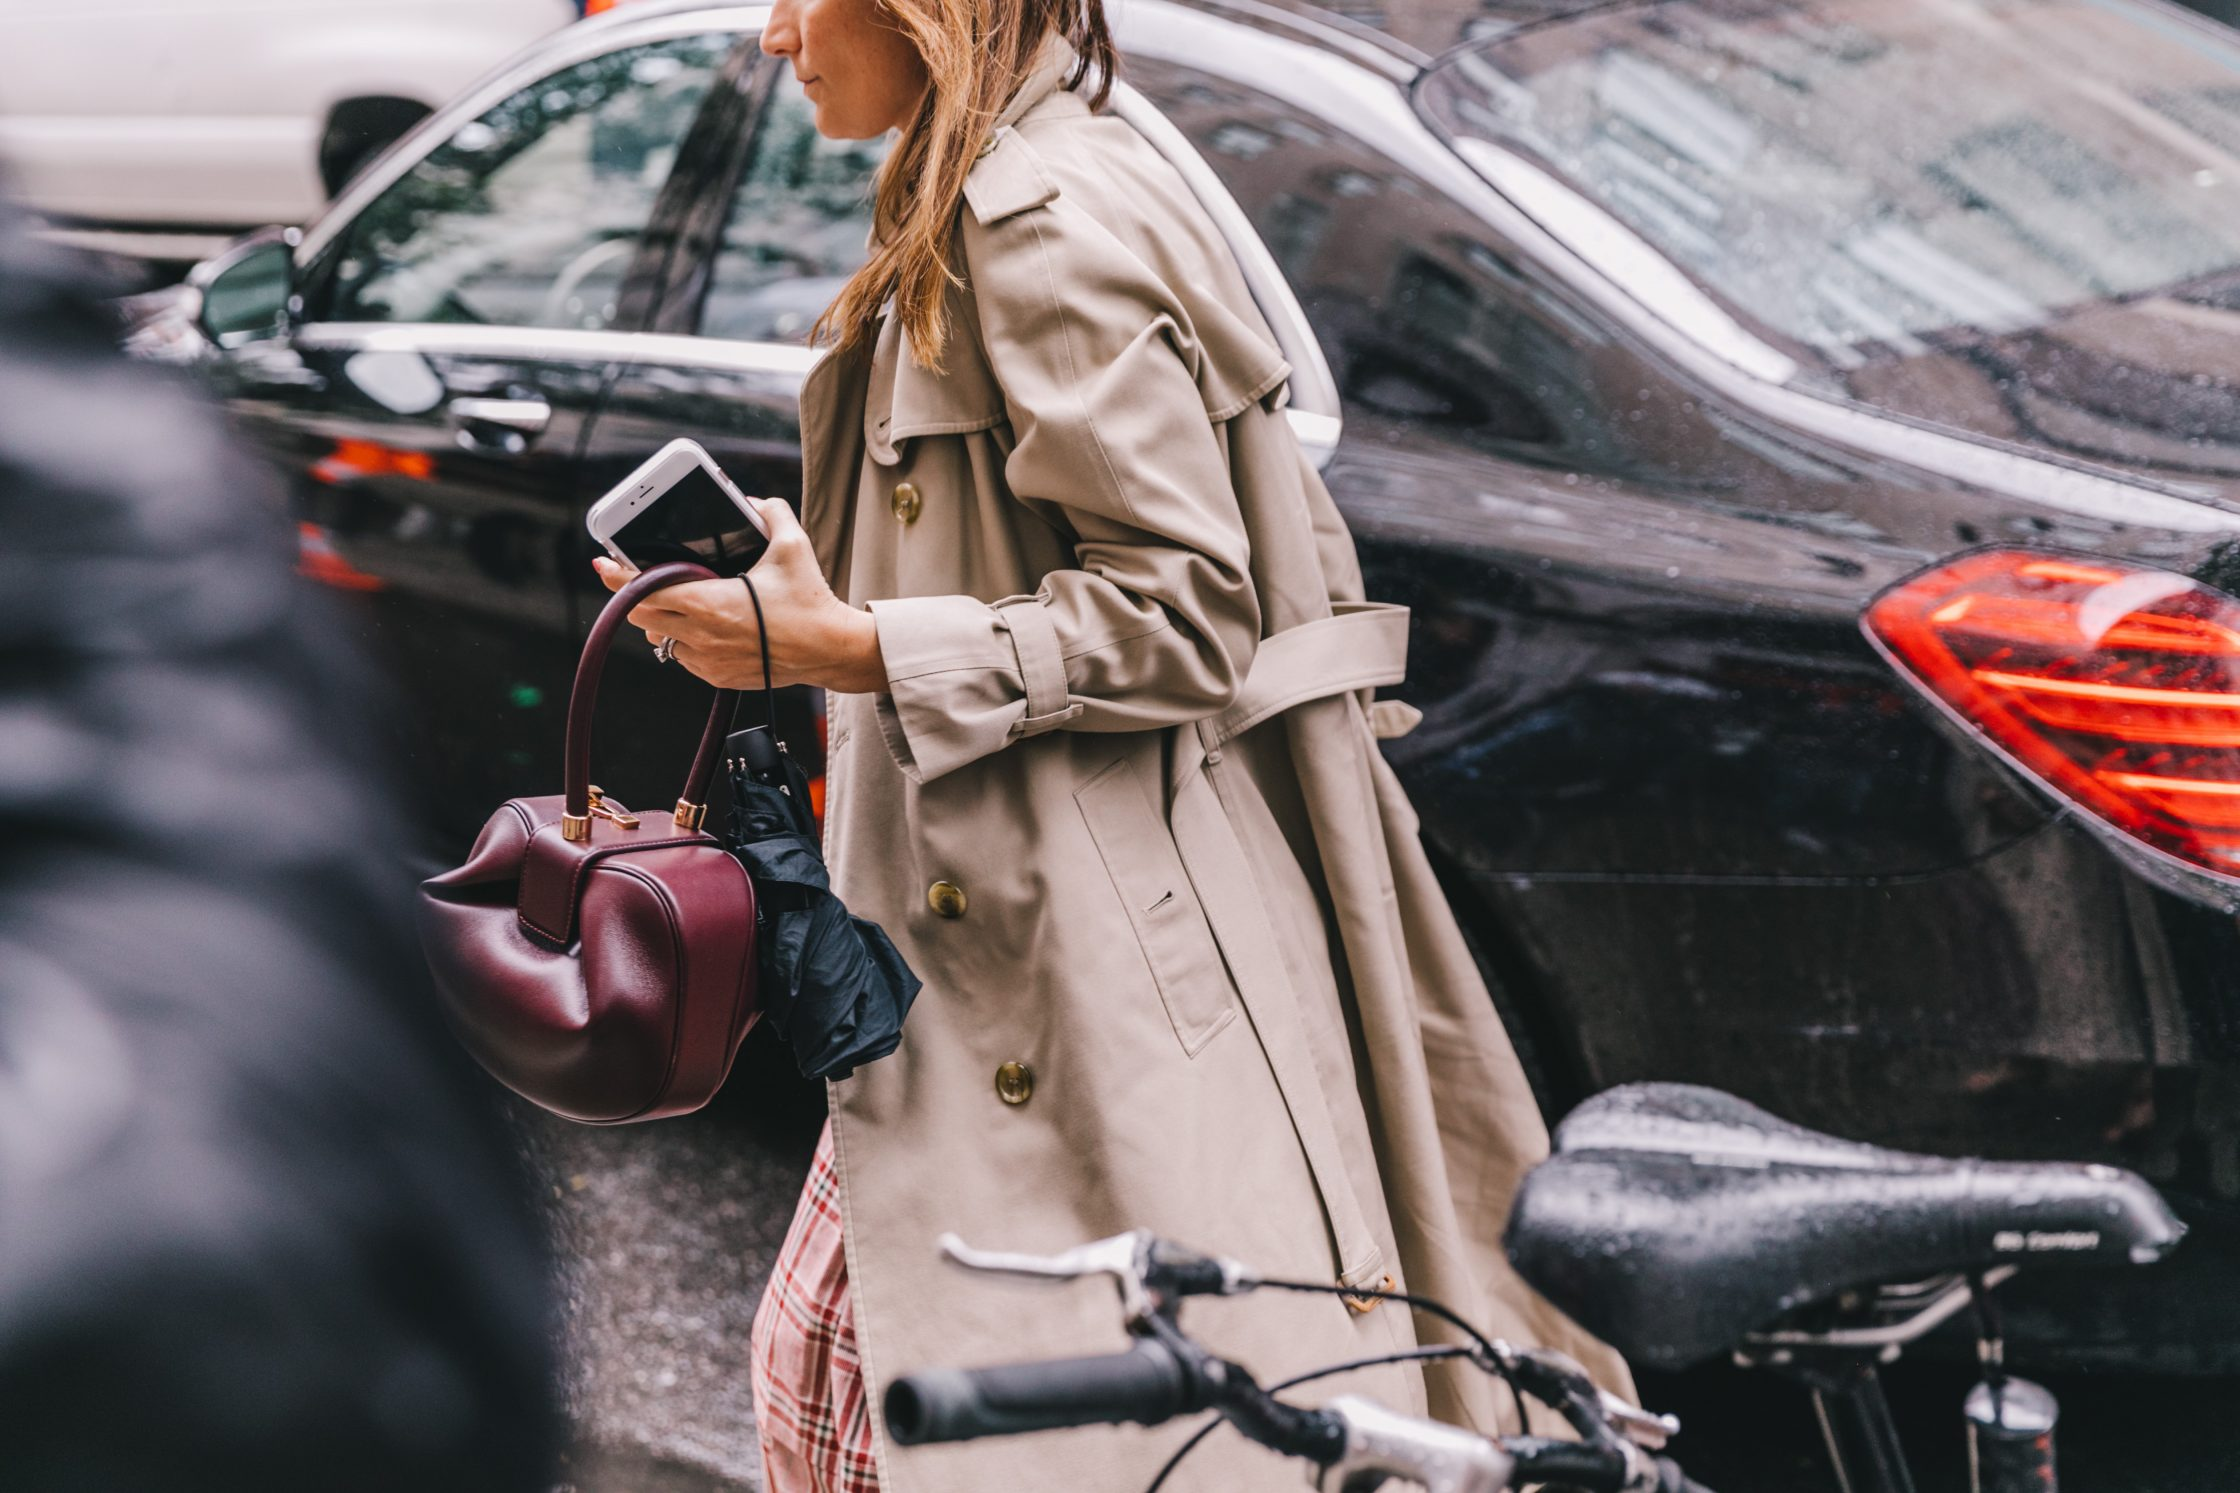 Collage_Vintage-NYFW-New_york_fashion_Week-Street_Style-104-1-2240x1493.jpg